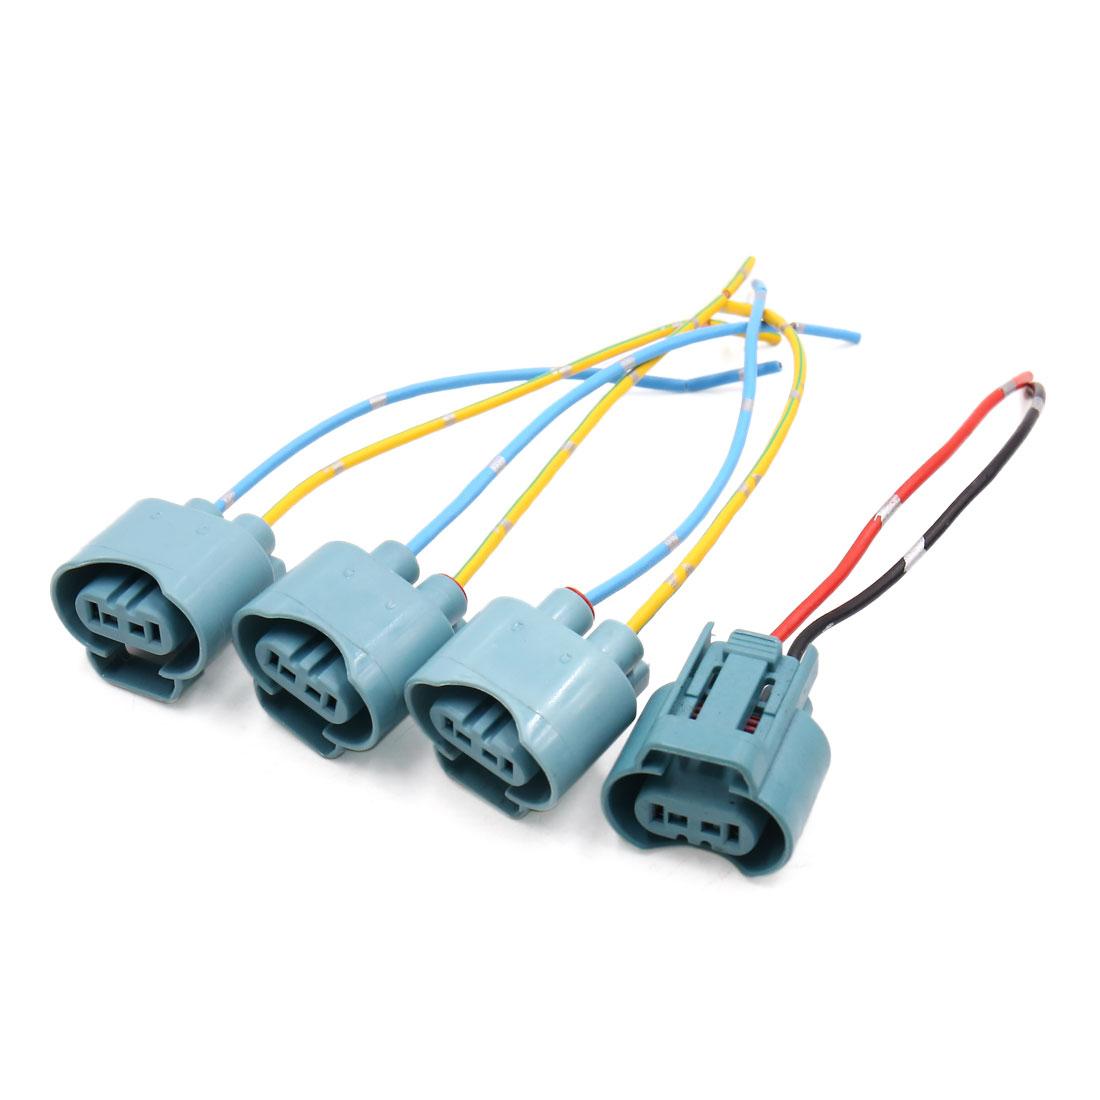 4Pcs 9005 Fog Light Lamp Bulb Socket Wiring Harness Connector Holder for Car